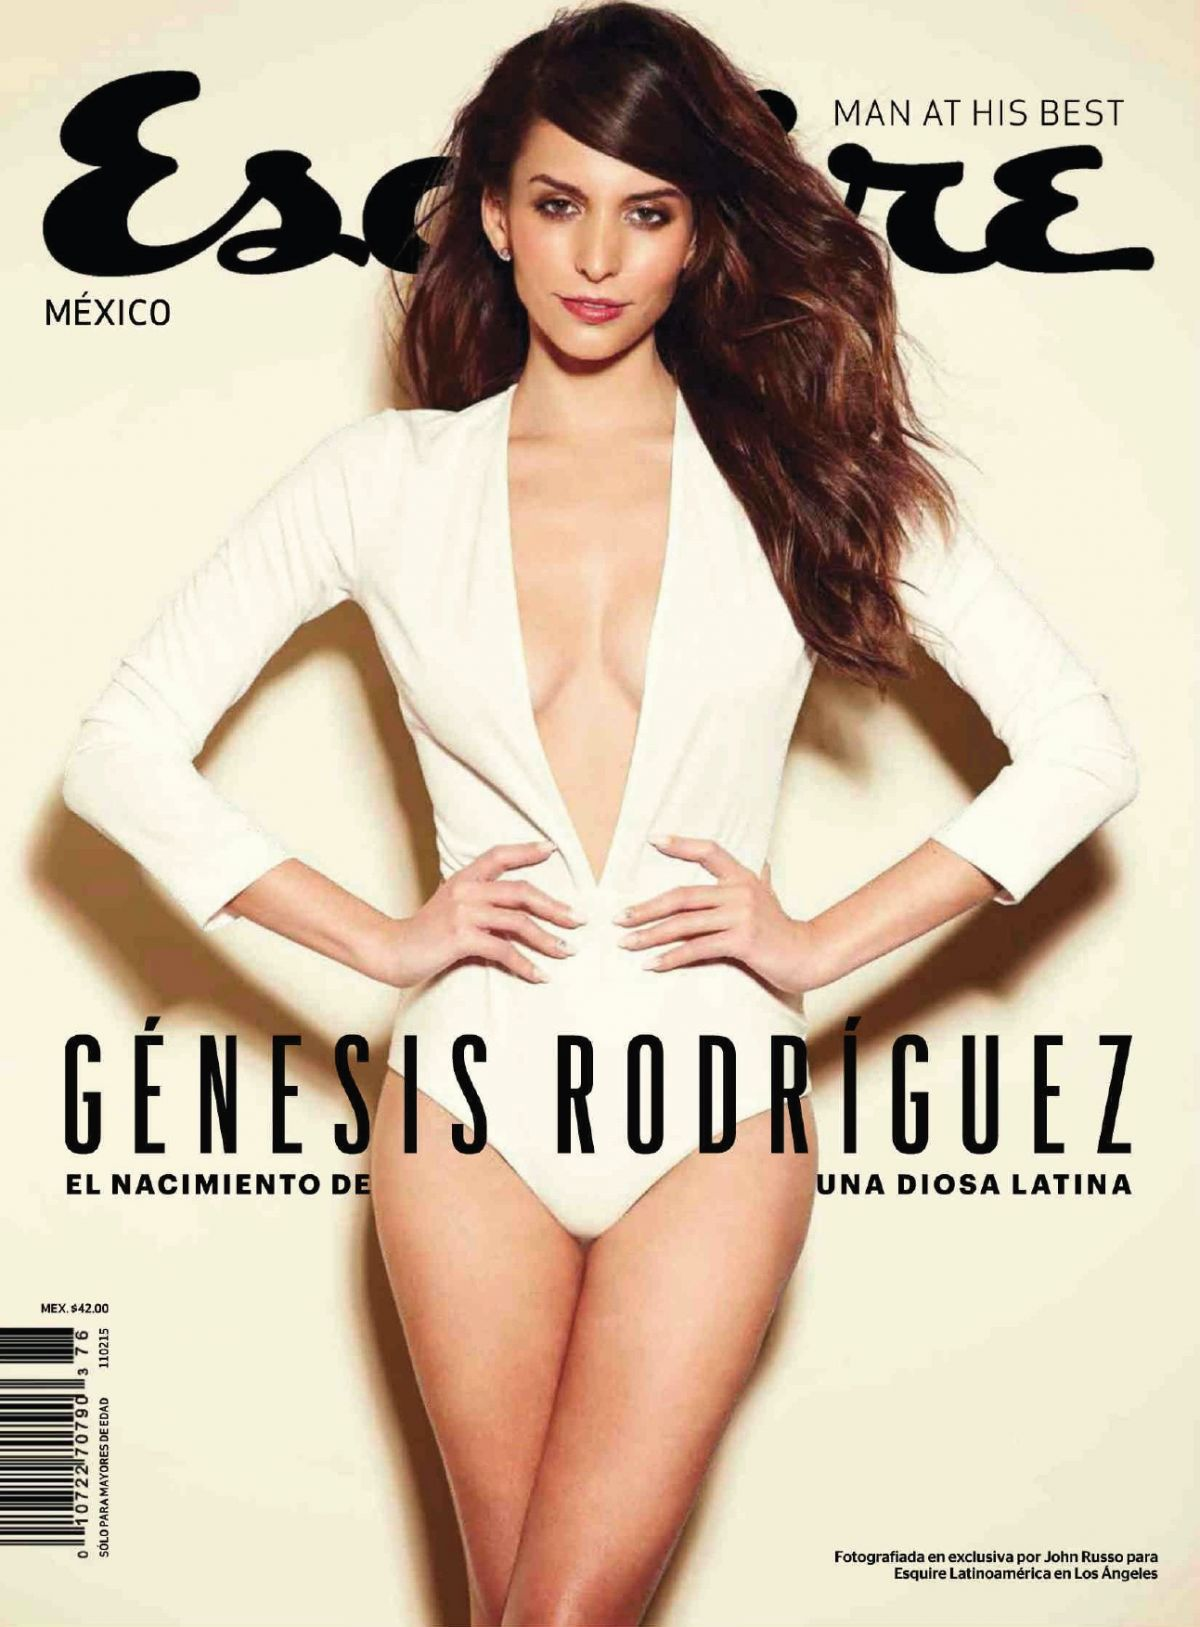 GENESIS RODRIGUEZ in Esquire Magazine, Mexico January 2015 Issue